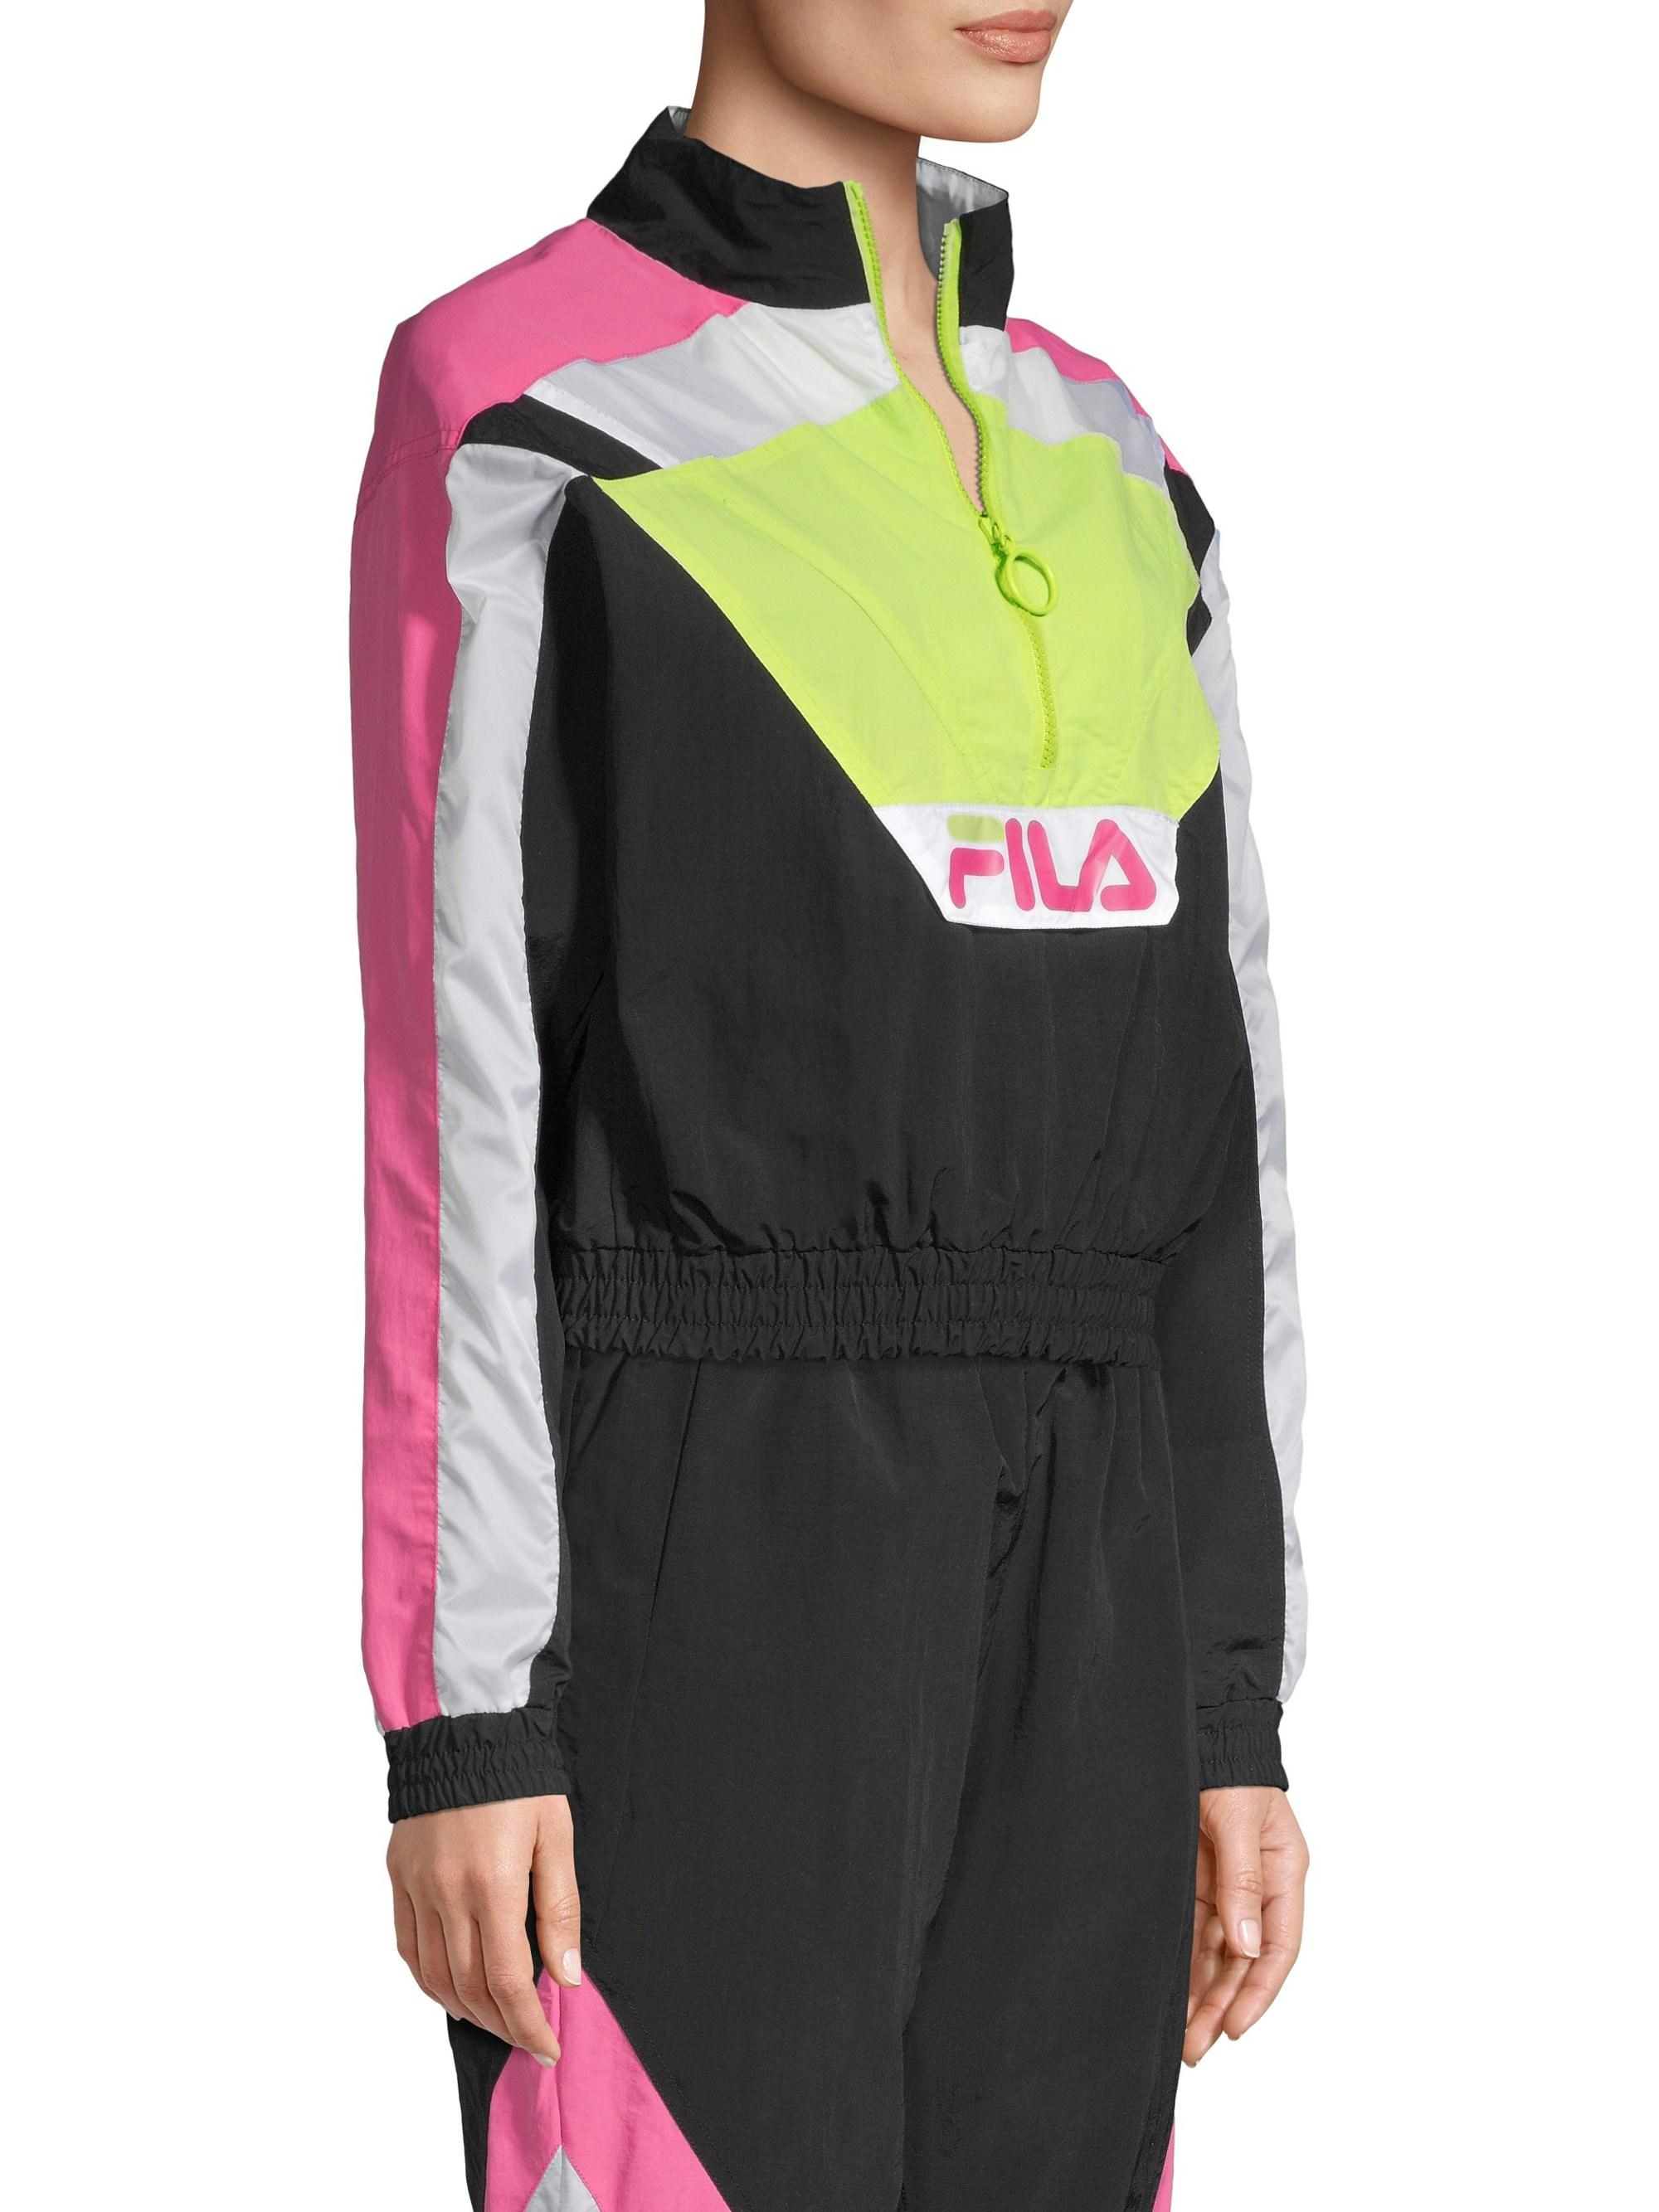 19e4d9a07de1 Fila Conchita Half-zip Wind Jacket - Lyst